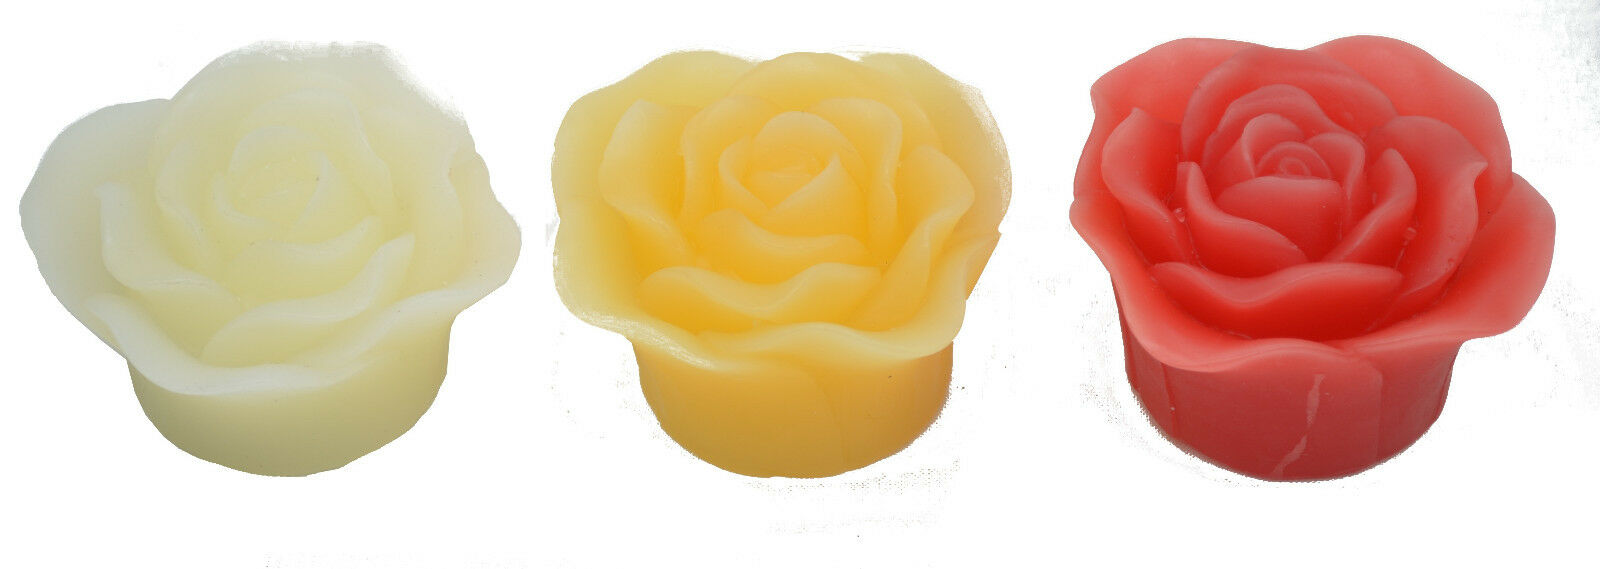 LED Kerze Rose Hellum Echtwachsrose Schwimmende Wachsrosen Kerzen Set Wachs